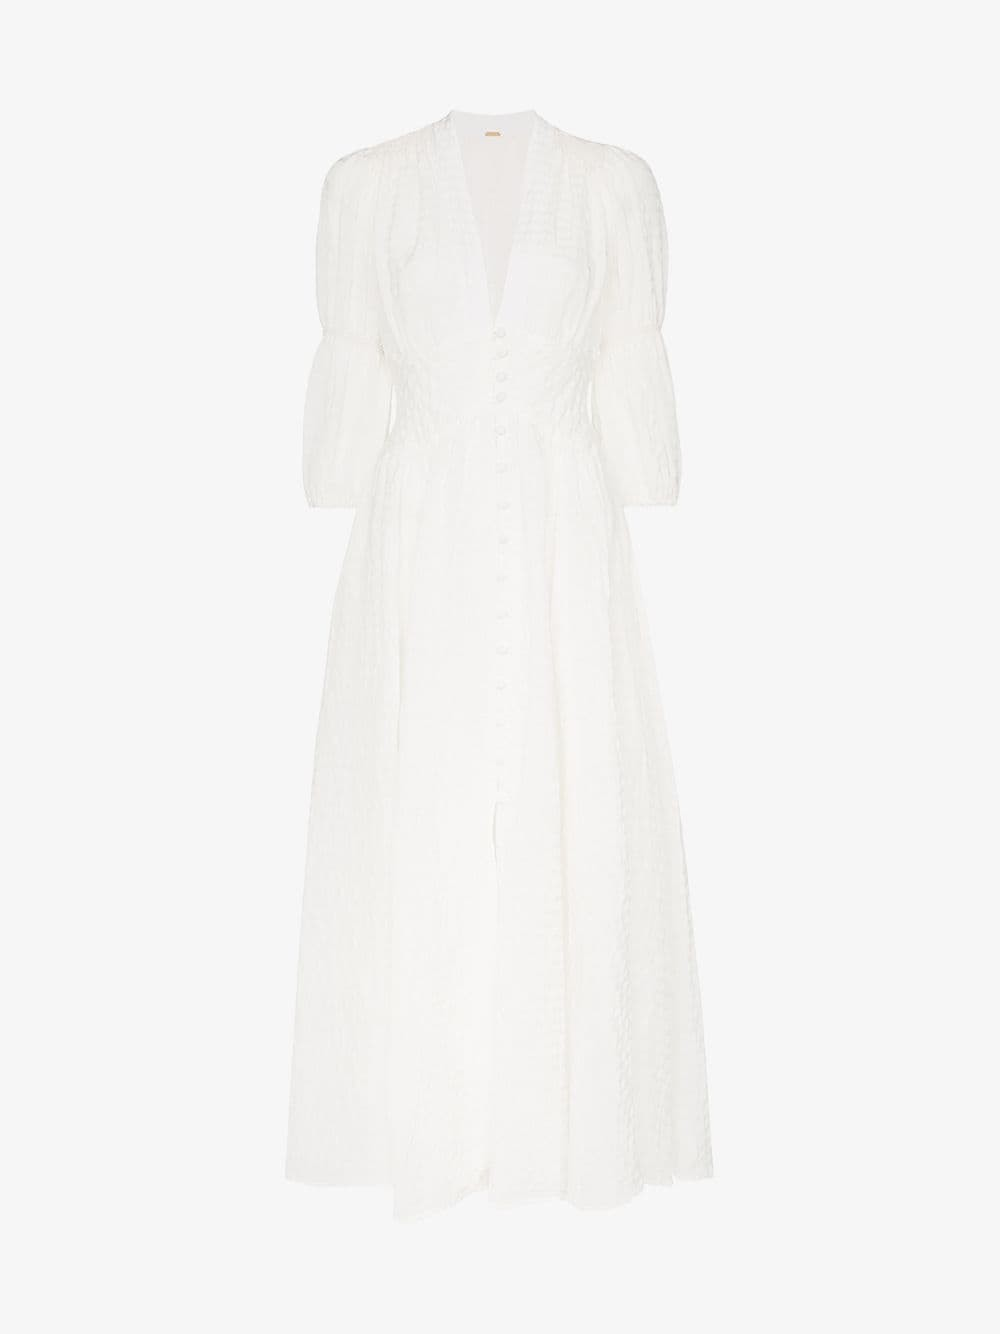 Cult Gaia Willow button-down linen blend dress in white